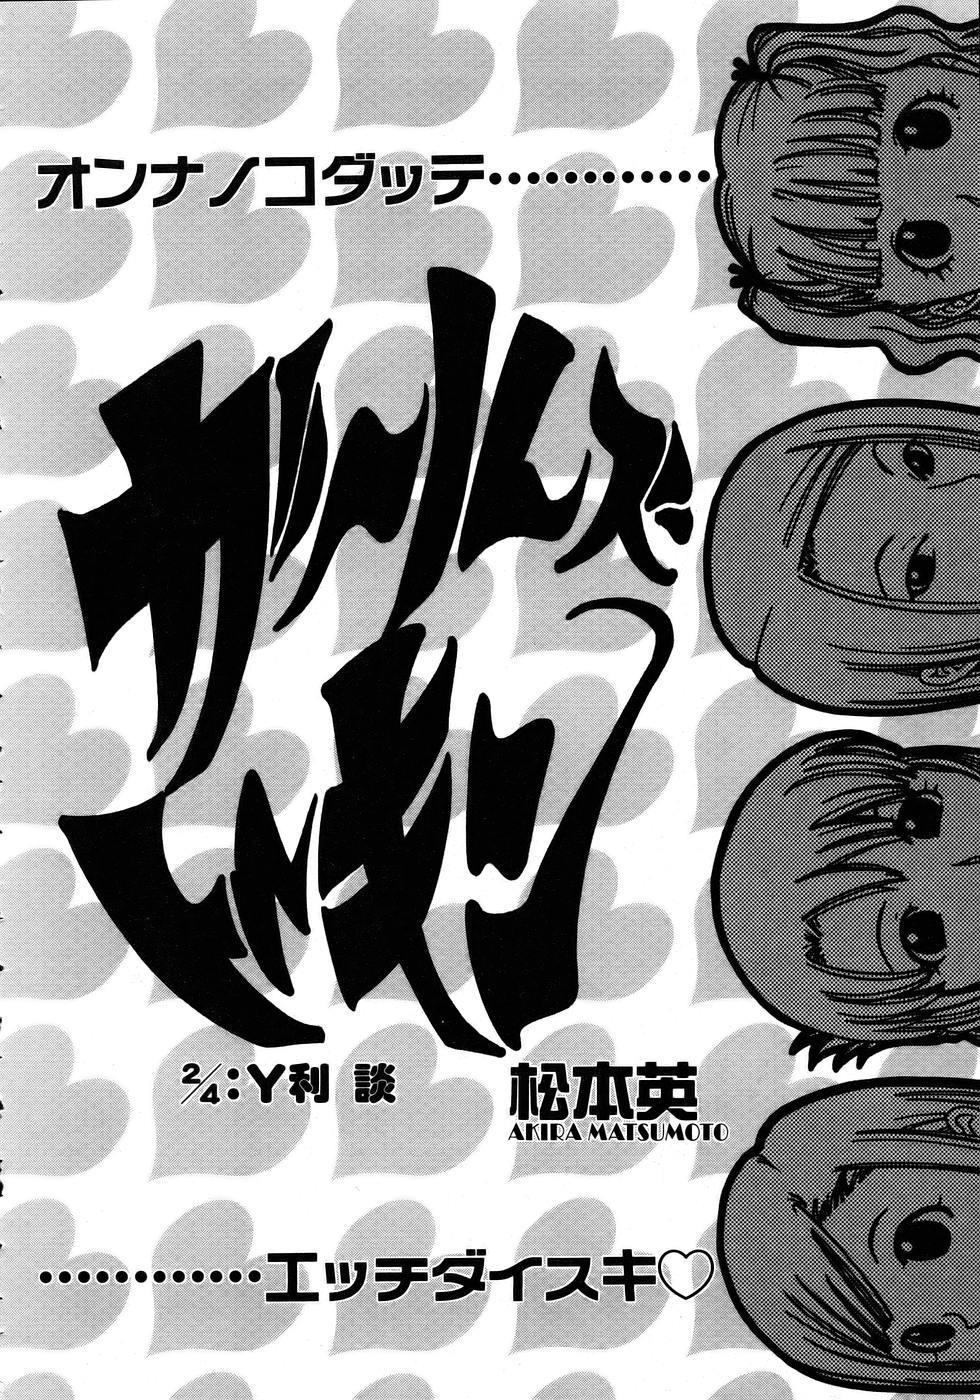 COMIC AUN 2005-12 Vol. 115 235